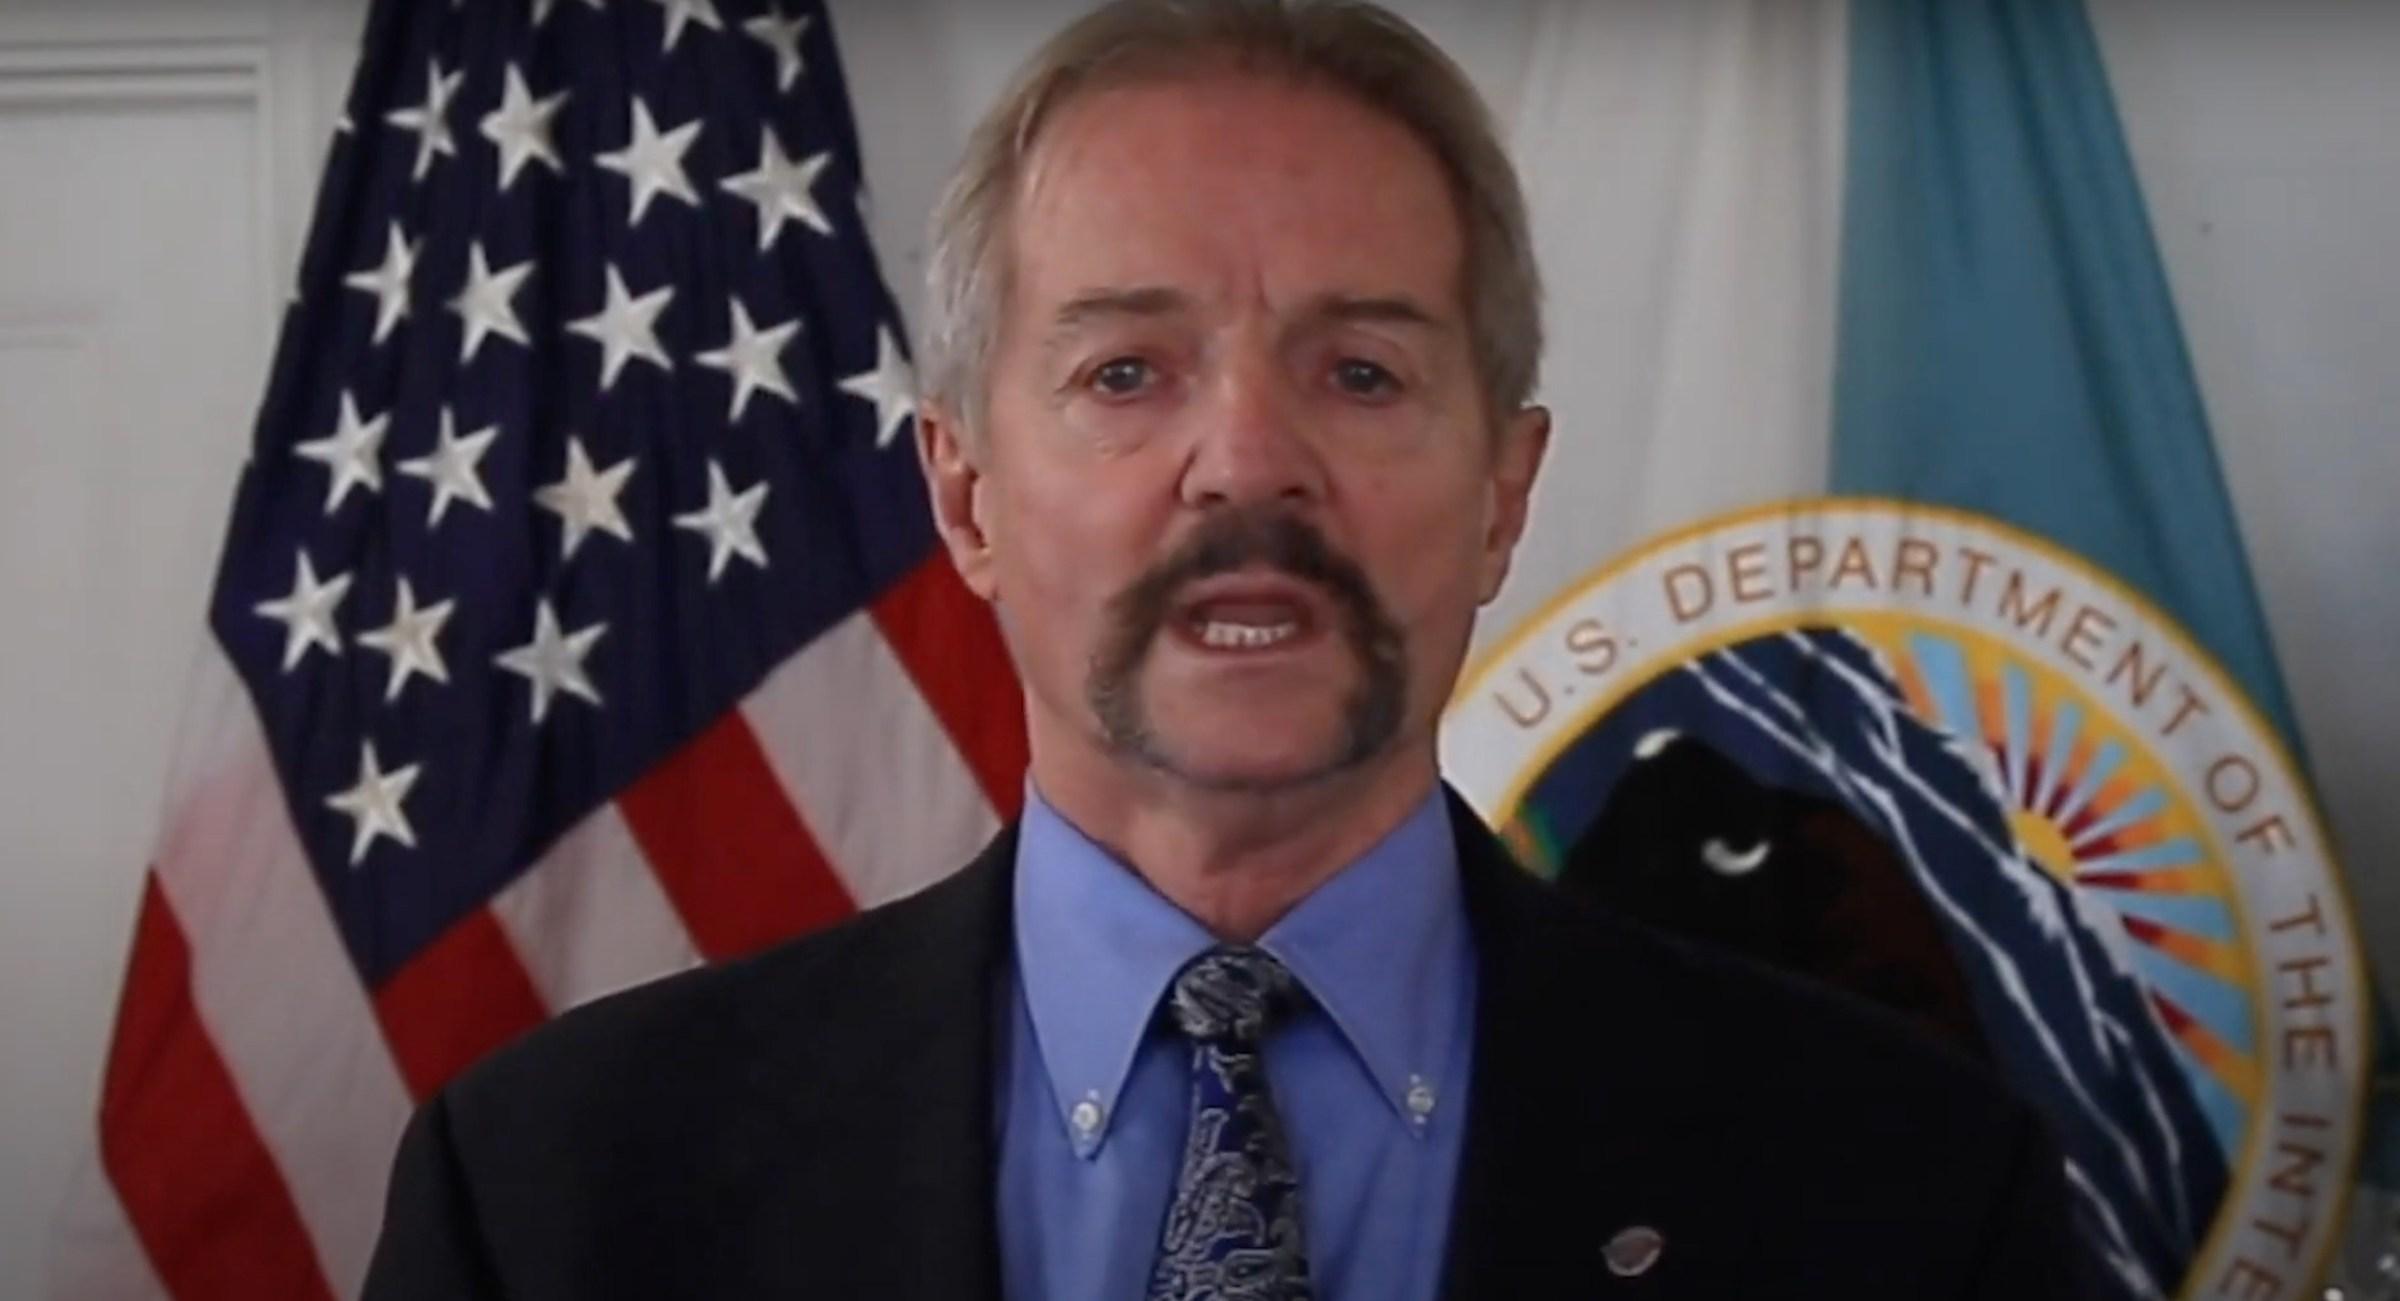 Look at Pendley's mustache